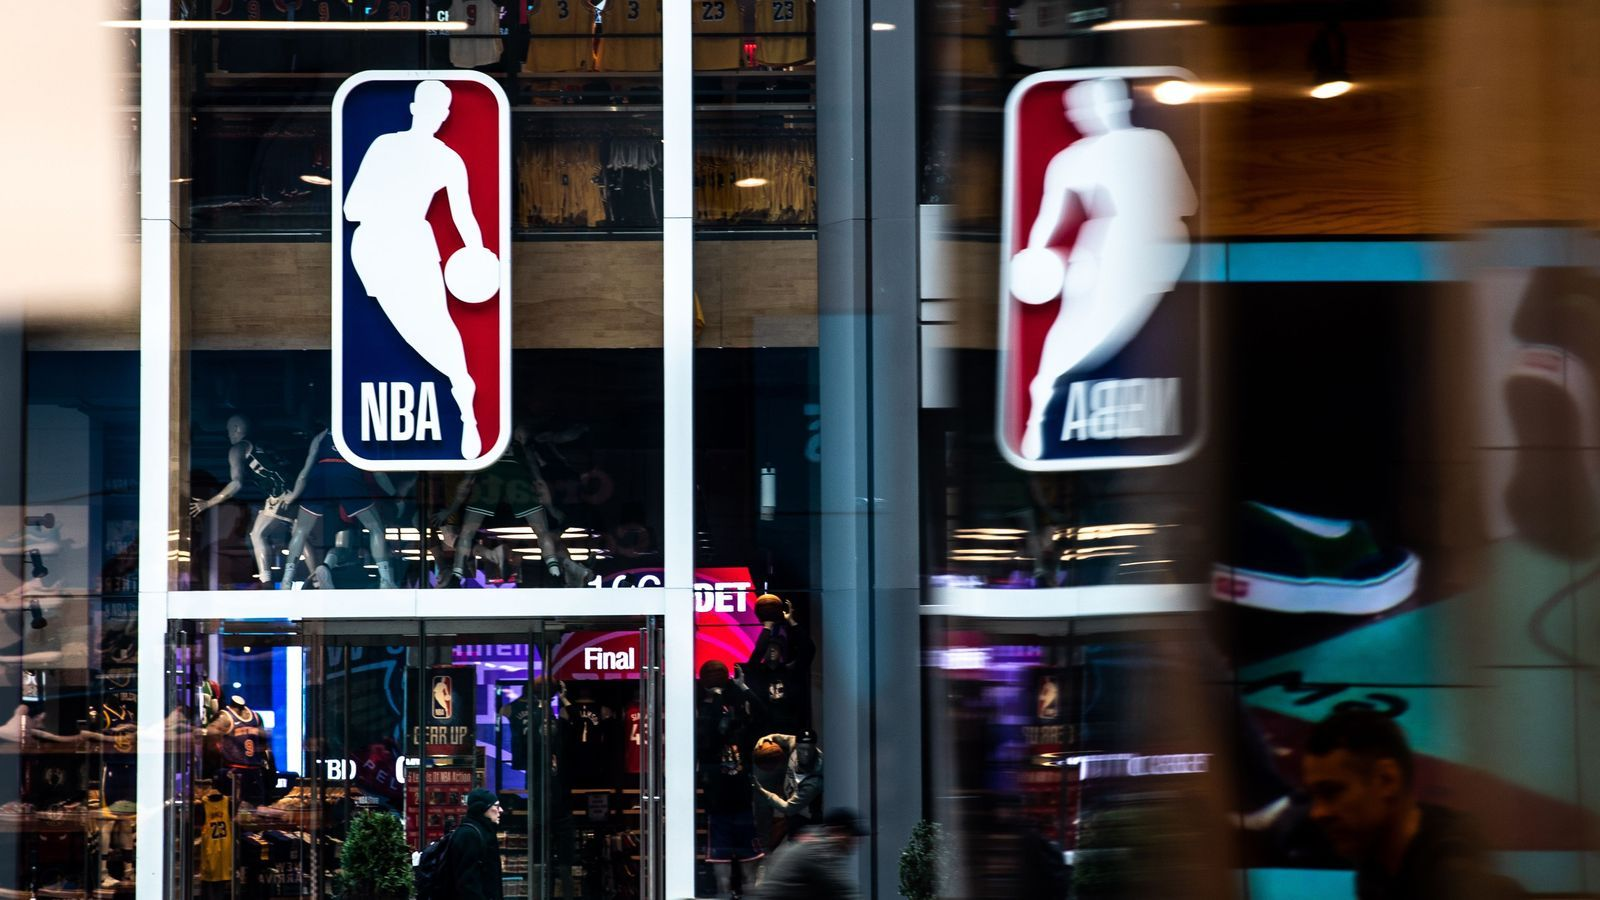 Botiga de la NBA a Nova York